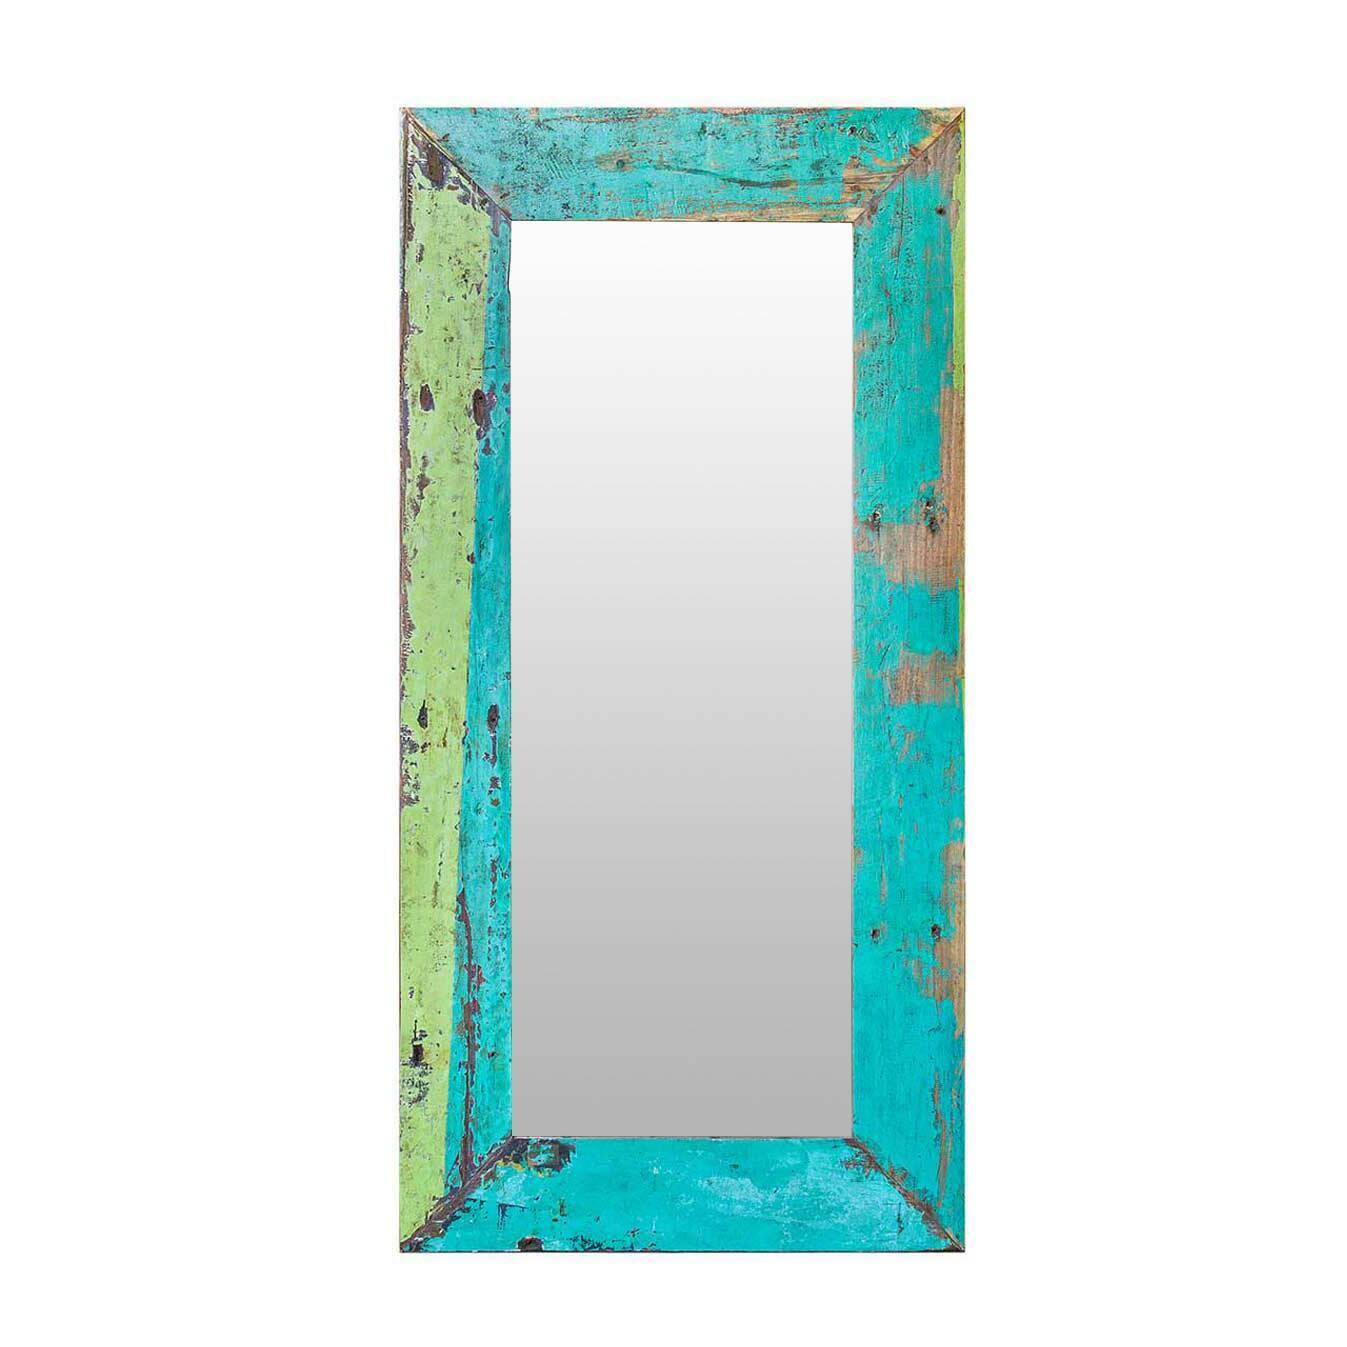 Зеркало Like Lodka 15576096 от Cosmorelax